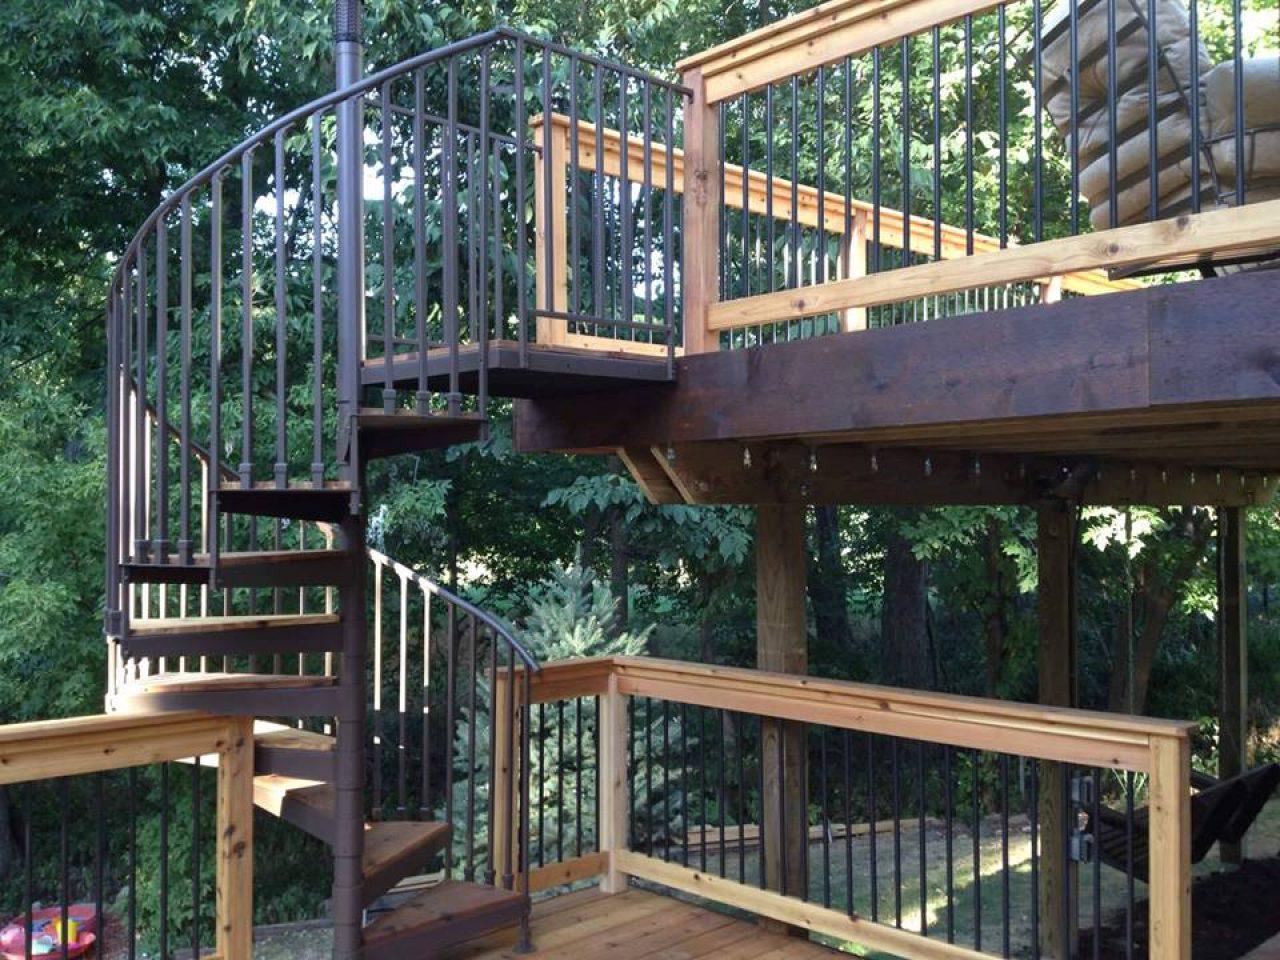 Genial Deck Spiral Staircase 1 Deck Spiral Staircase 2 ...